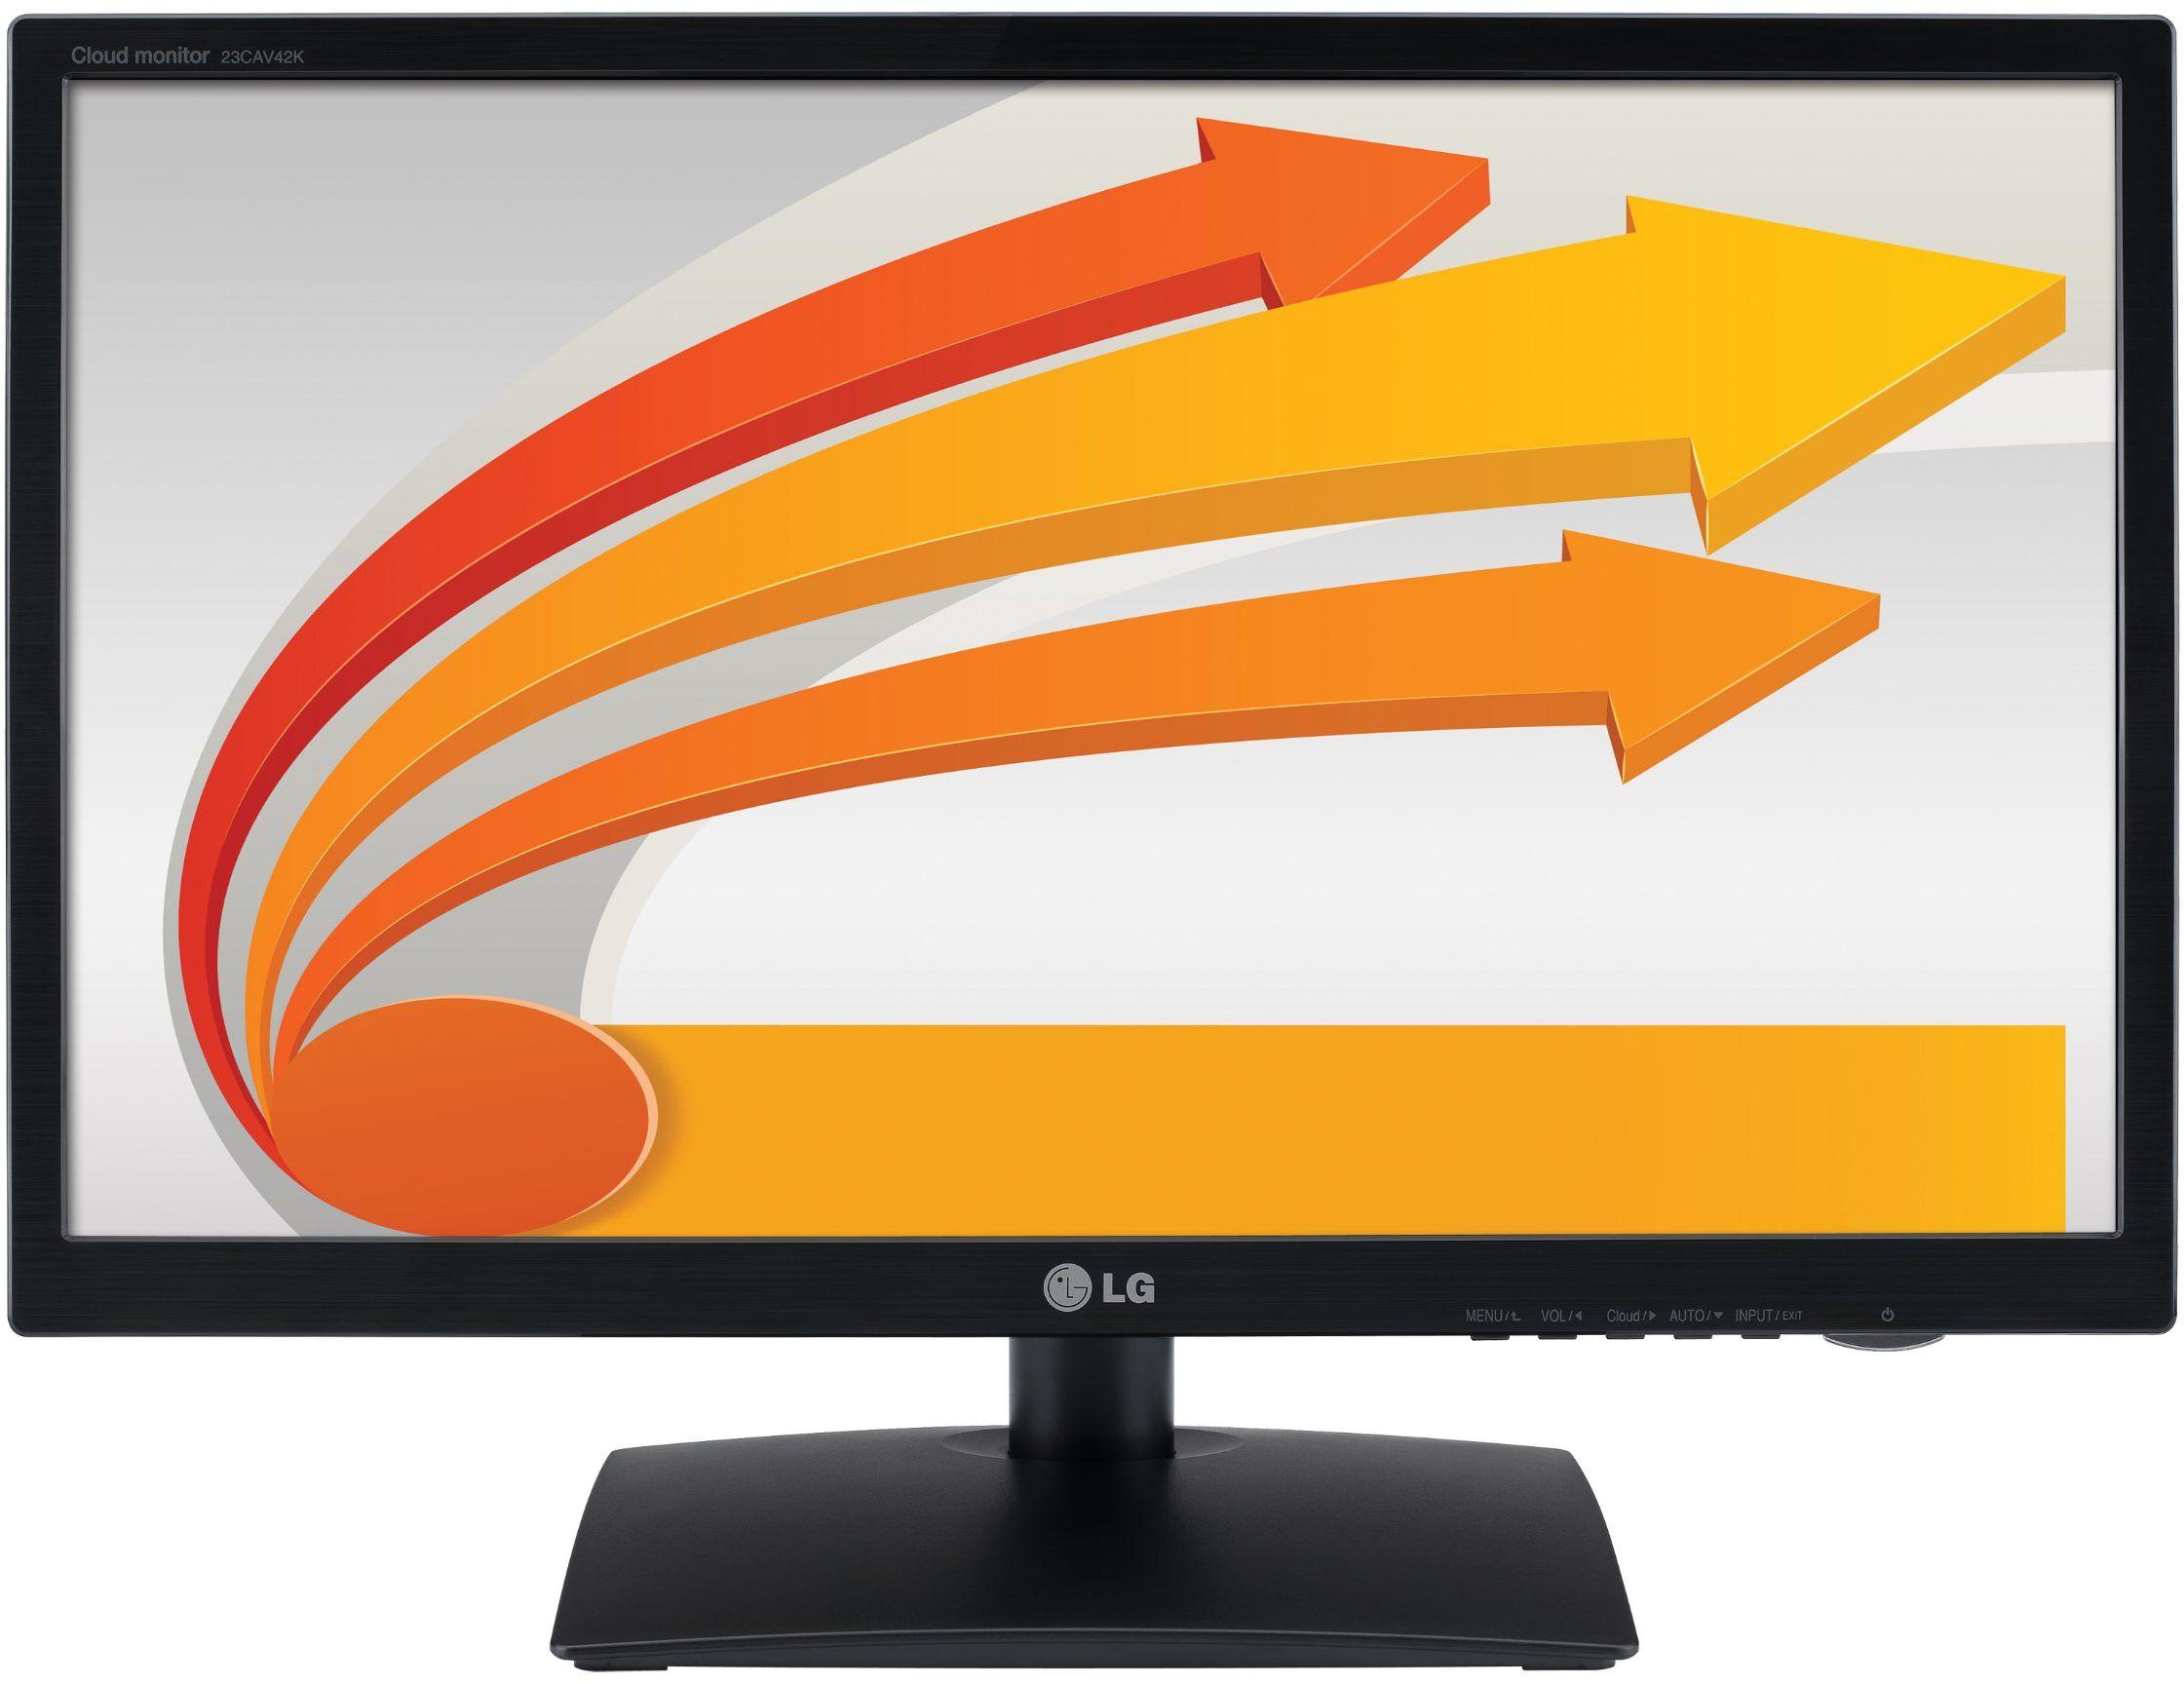 LG 23CAT42K-B.AEU 58,4 cm (23 cali) monitor LED (DVI-D, sieć, VGA/D-Sub, USB, czas reakcji 14 ms, kolor czarny